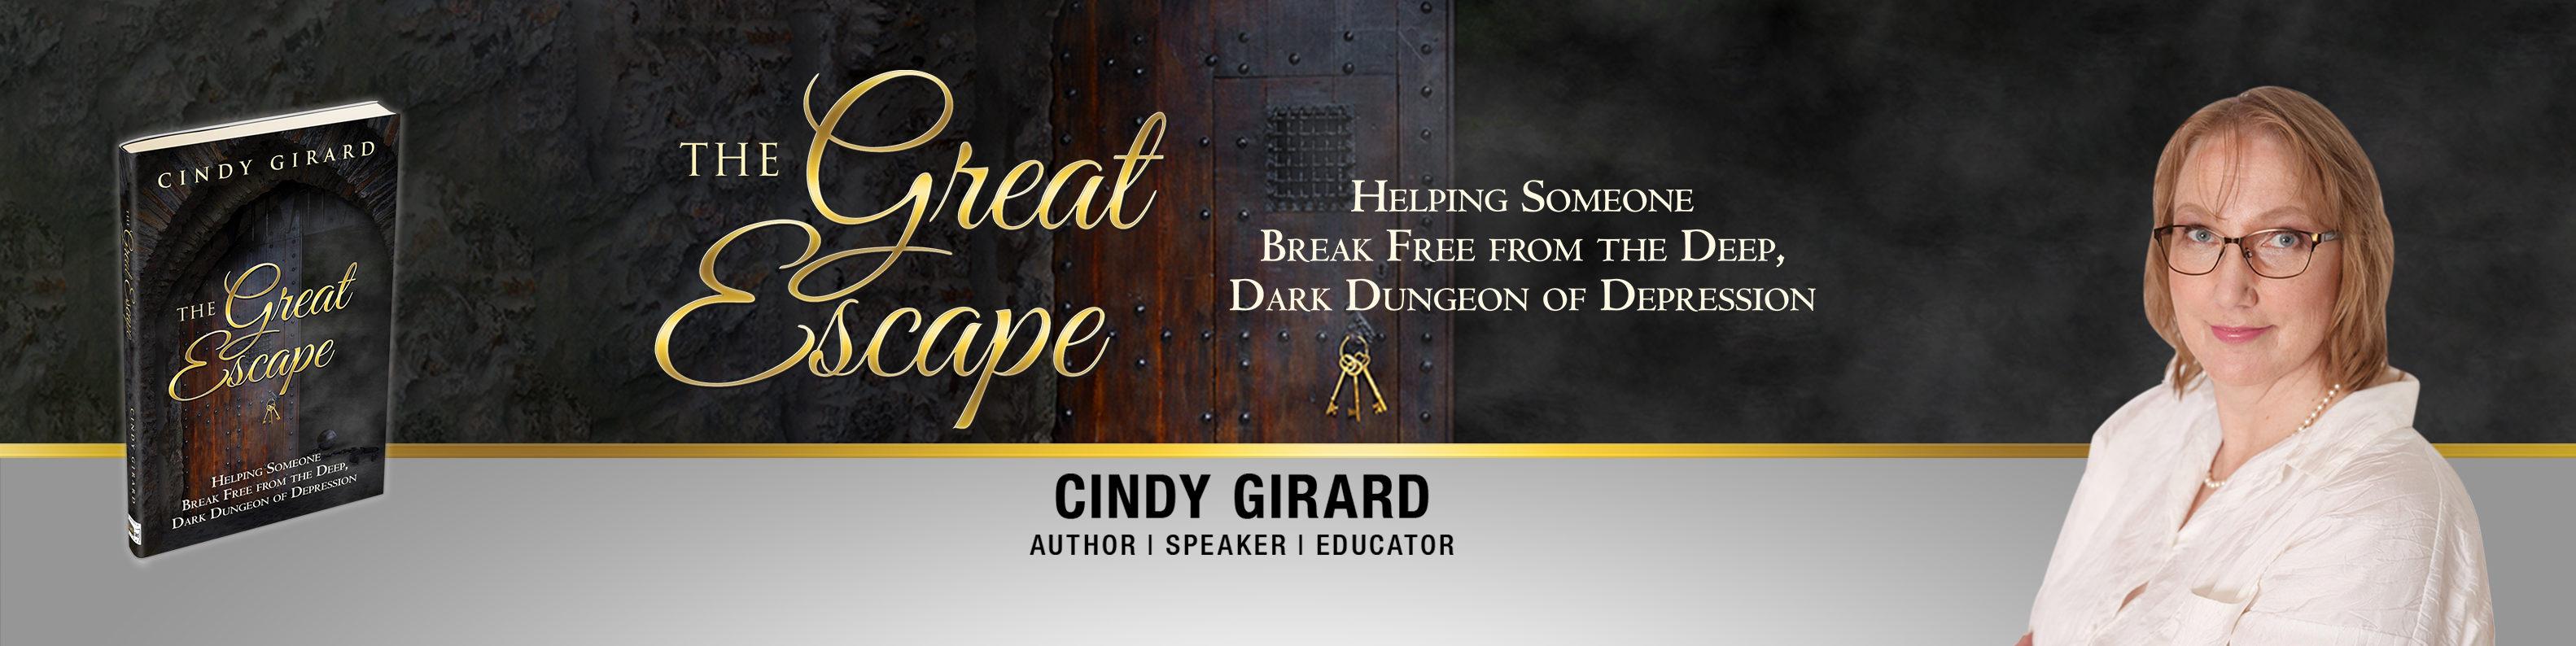 Cindy Girard